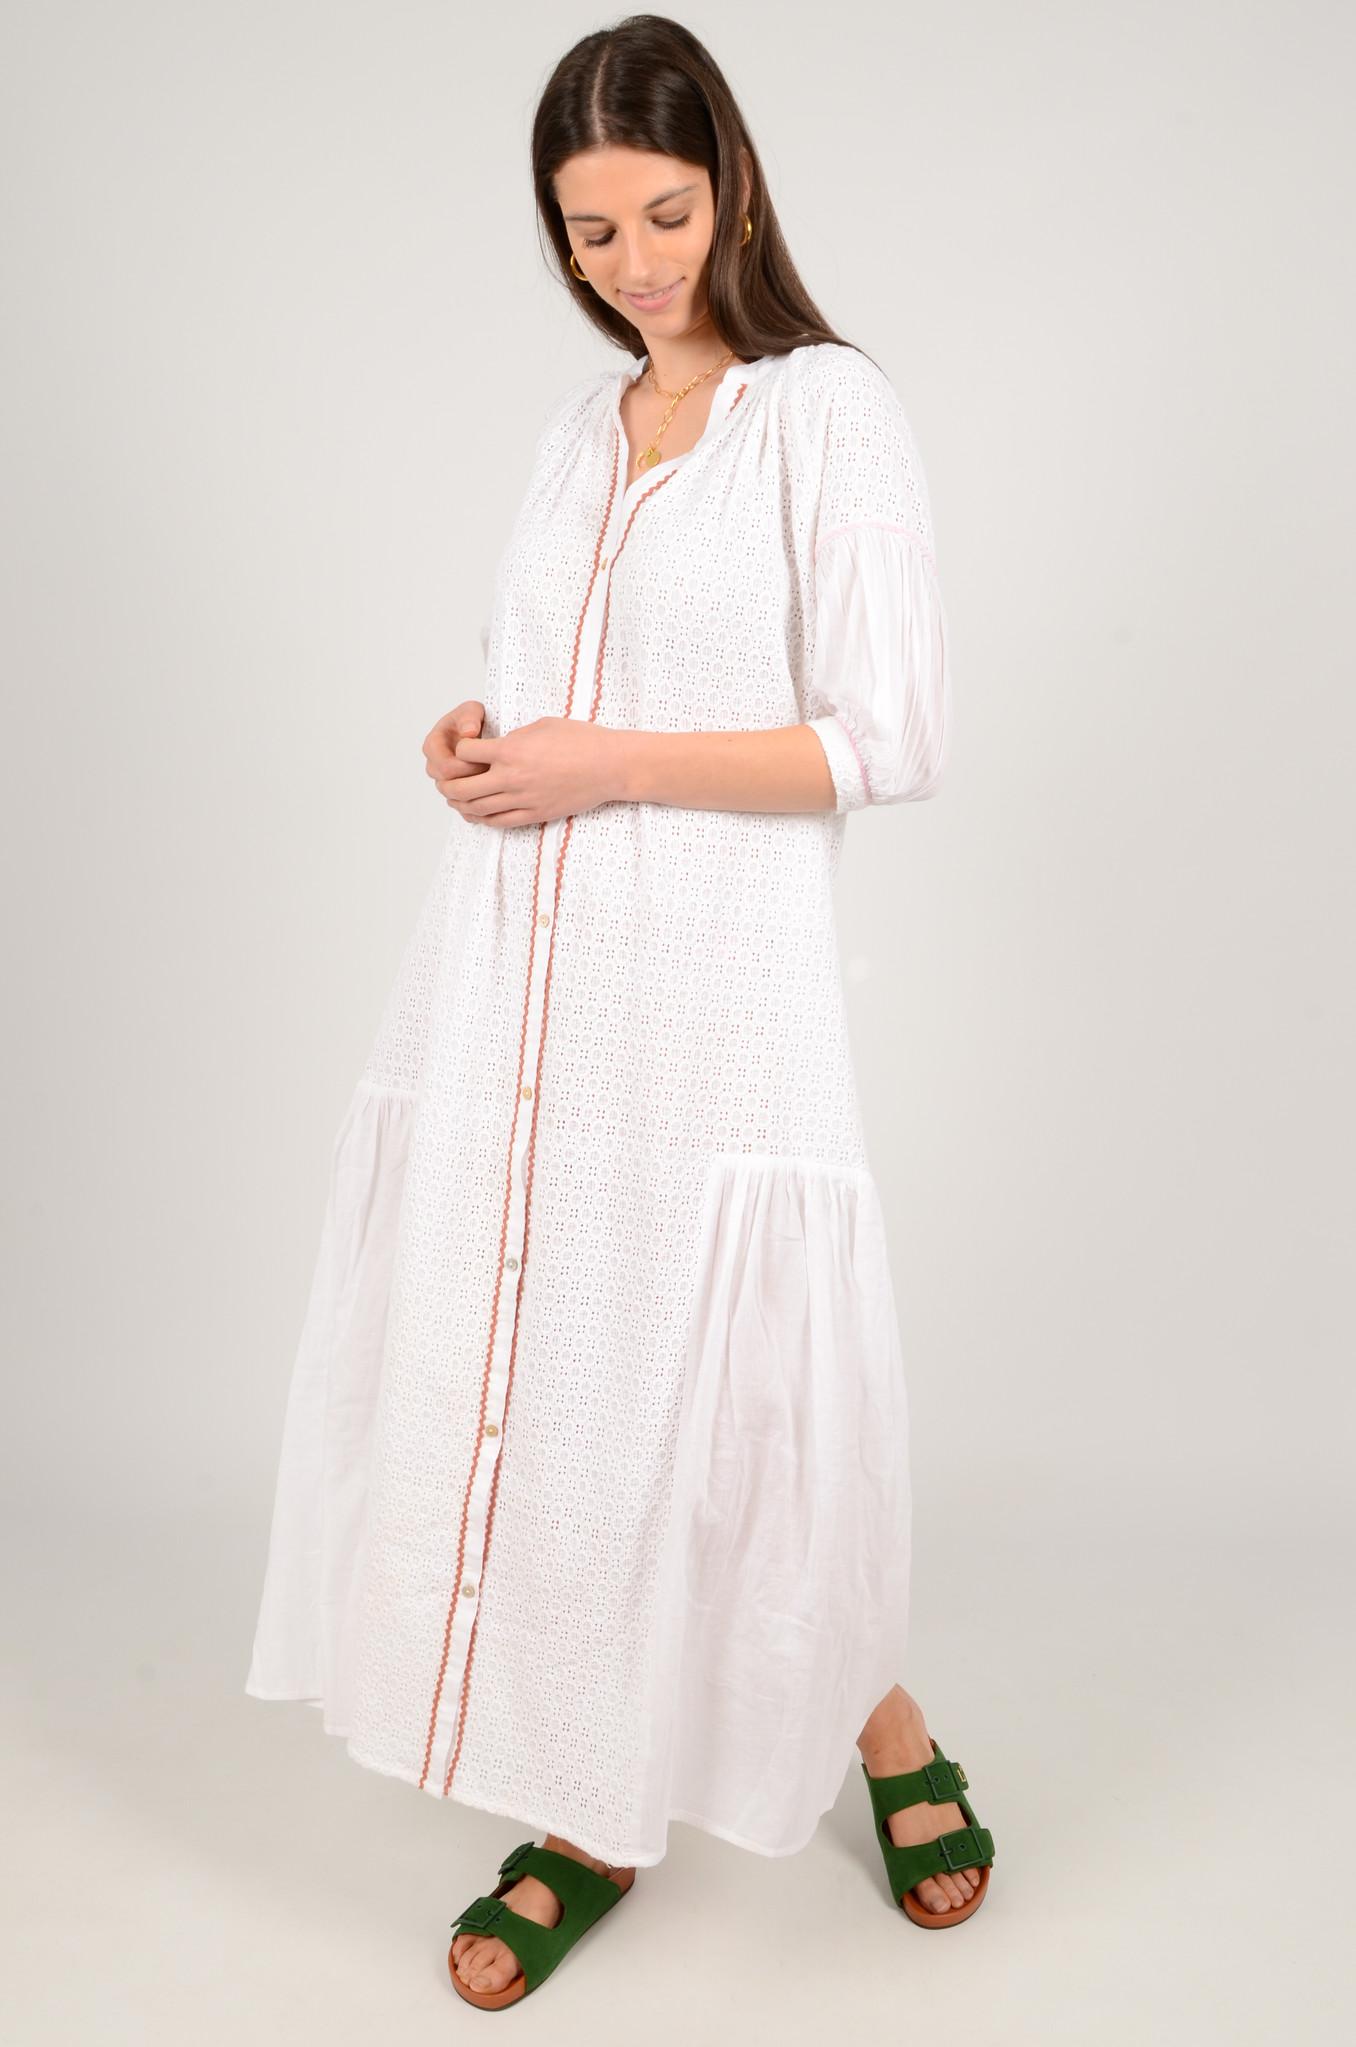 MANISE DRESS-2